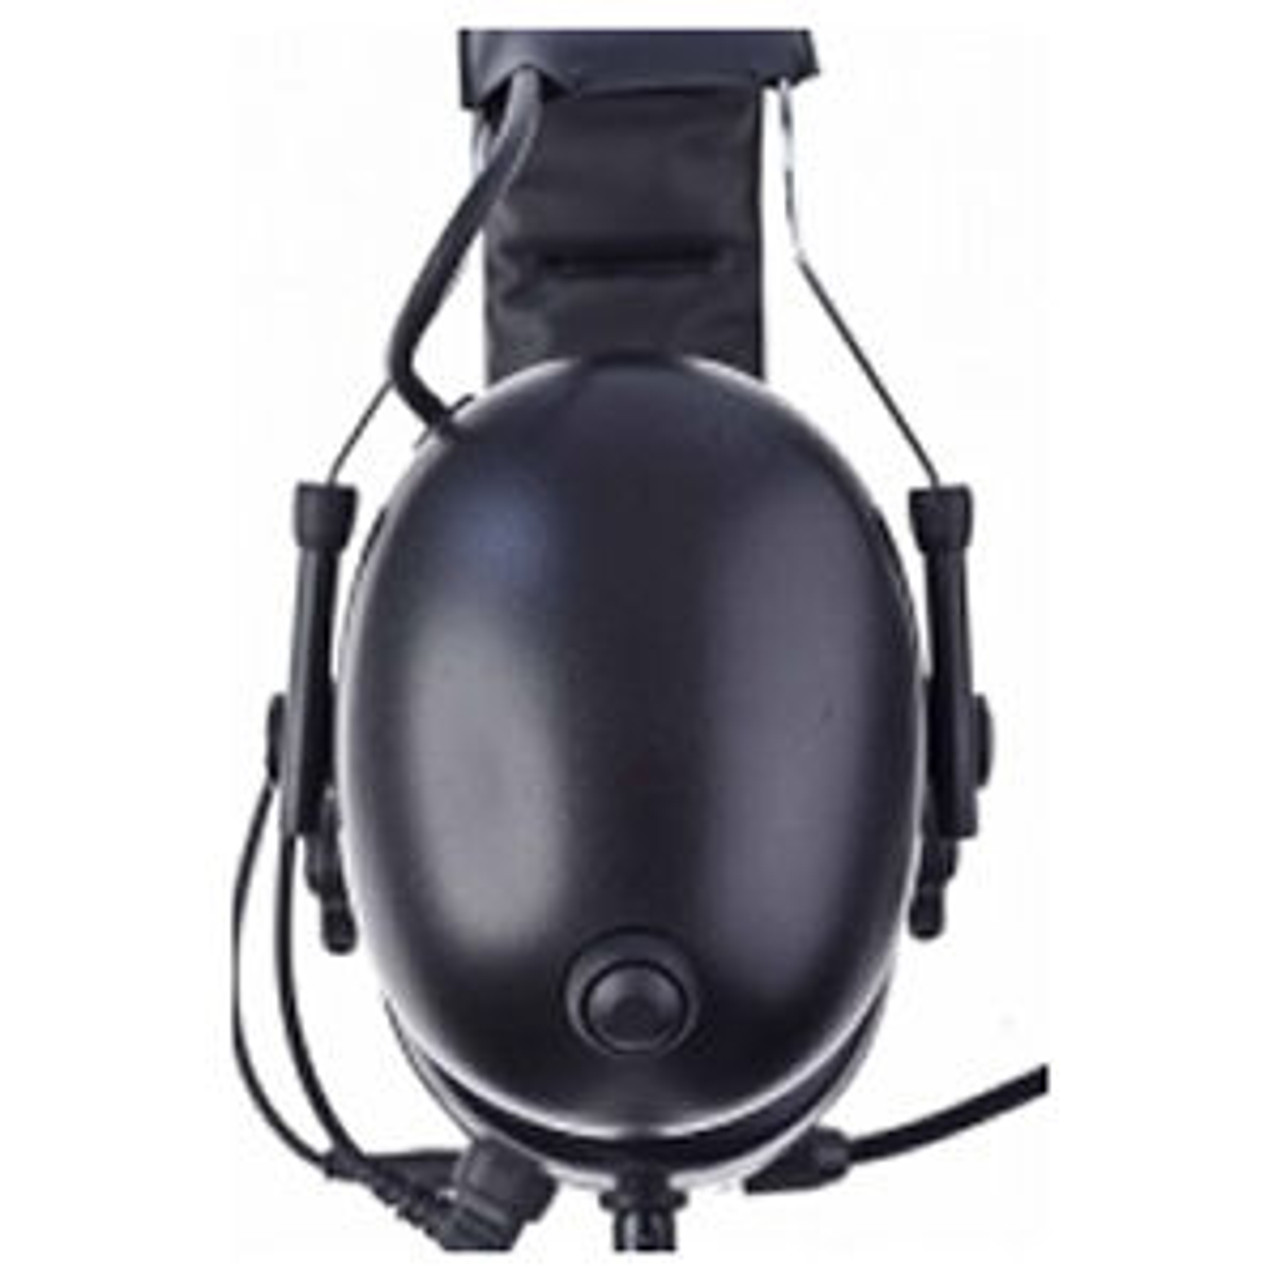 Bendix King GPH Over The Head Double Muff Headset